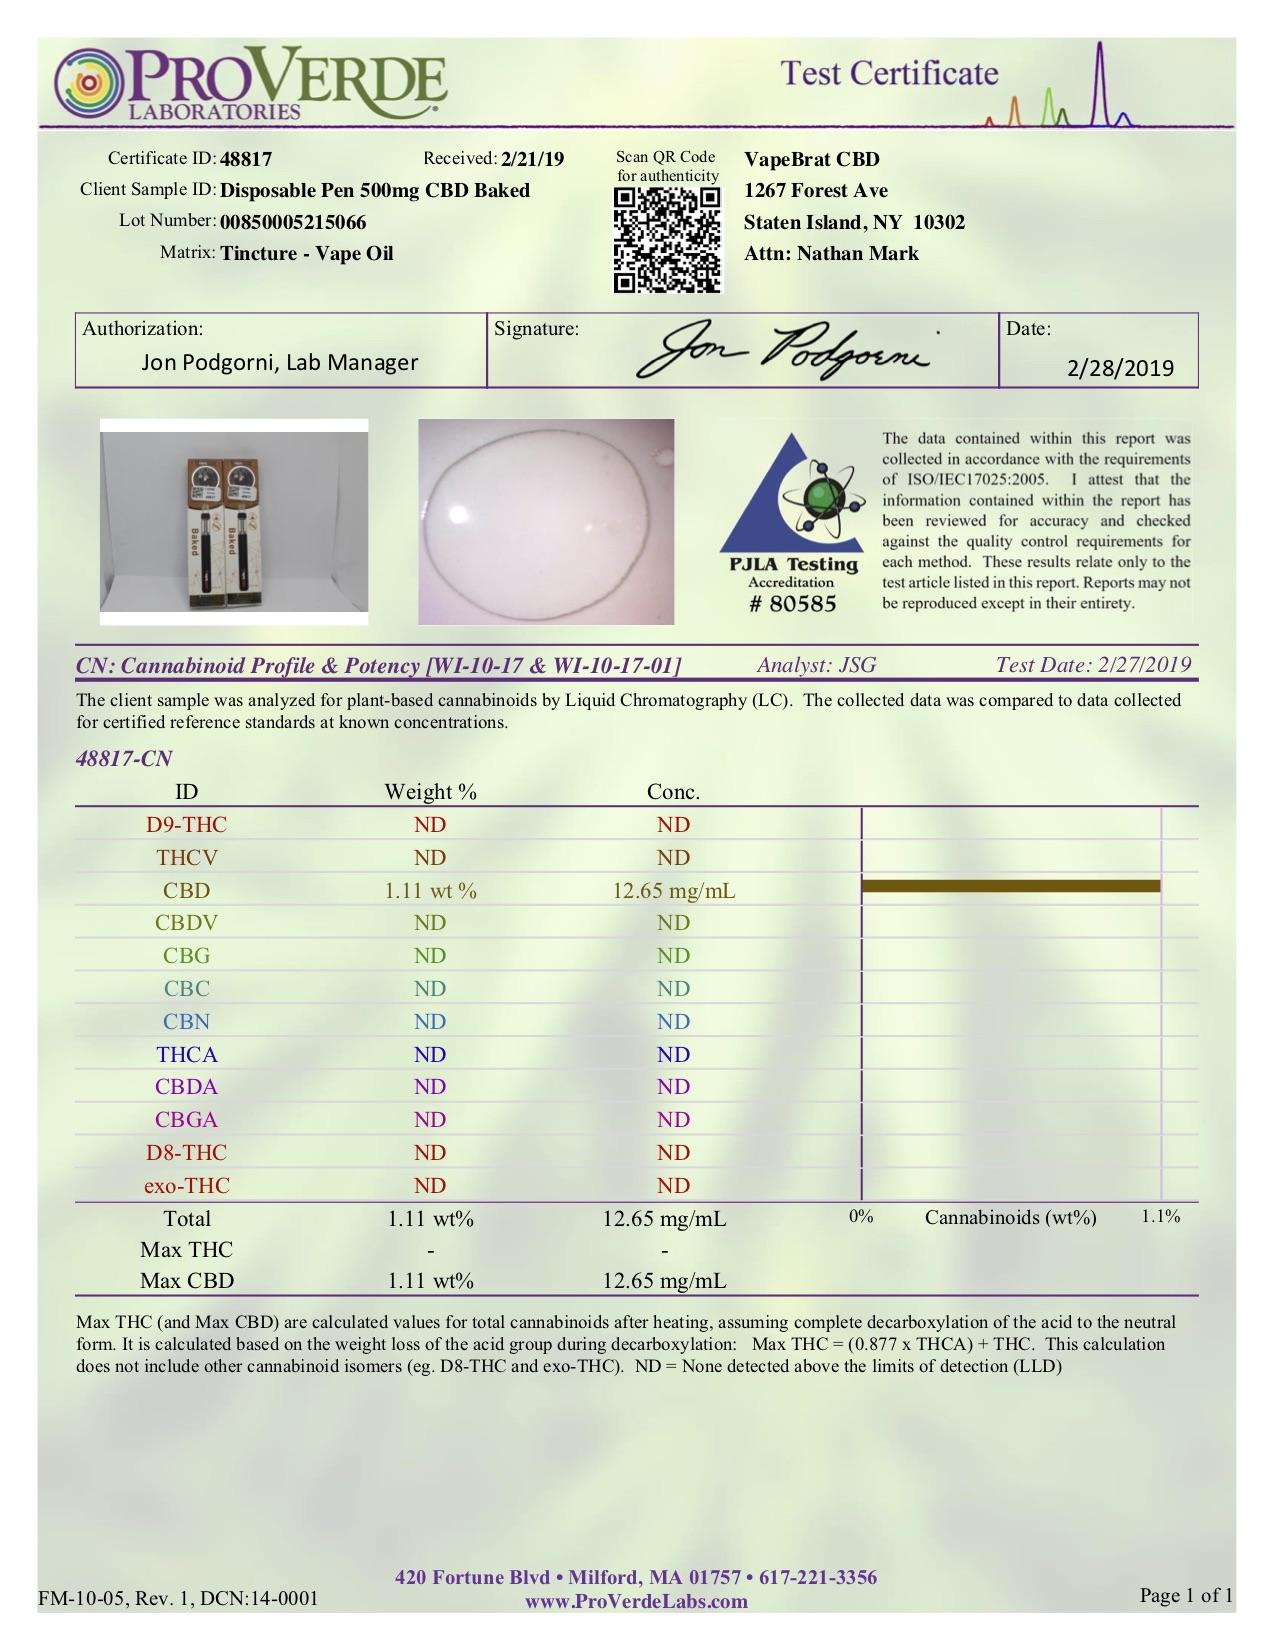 48817-cn-disposable-pen-500mg-cbd-baked.jpg